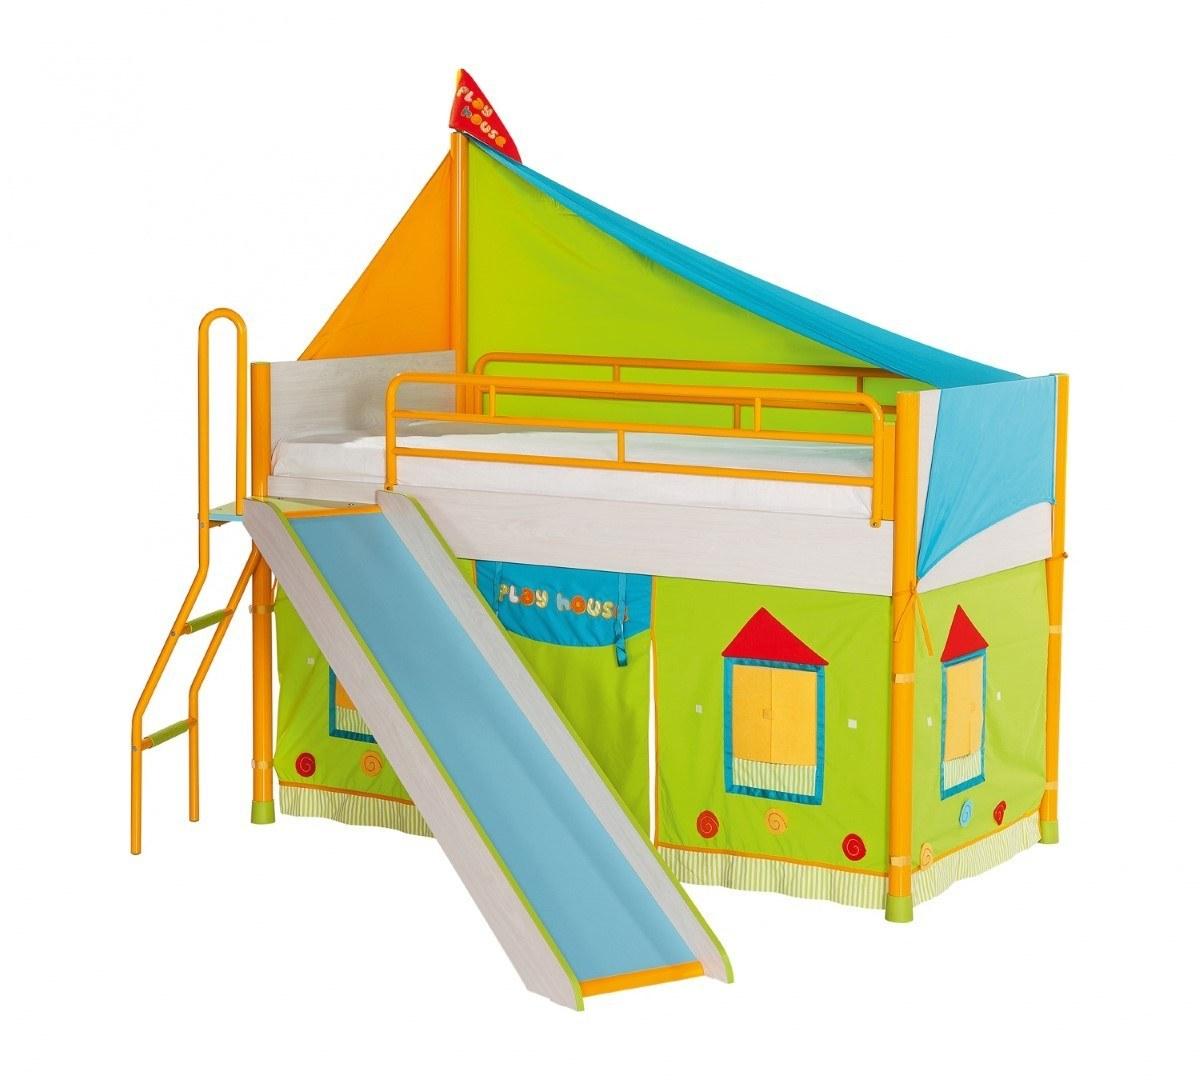 Playhouse-Xs-Bed-90x180-Cm-Slide1